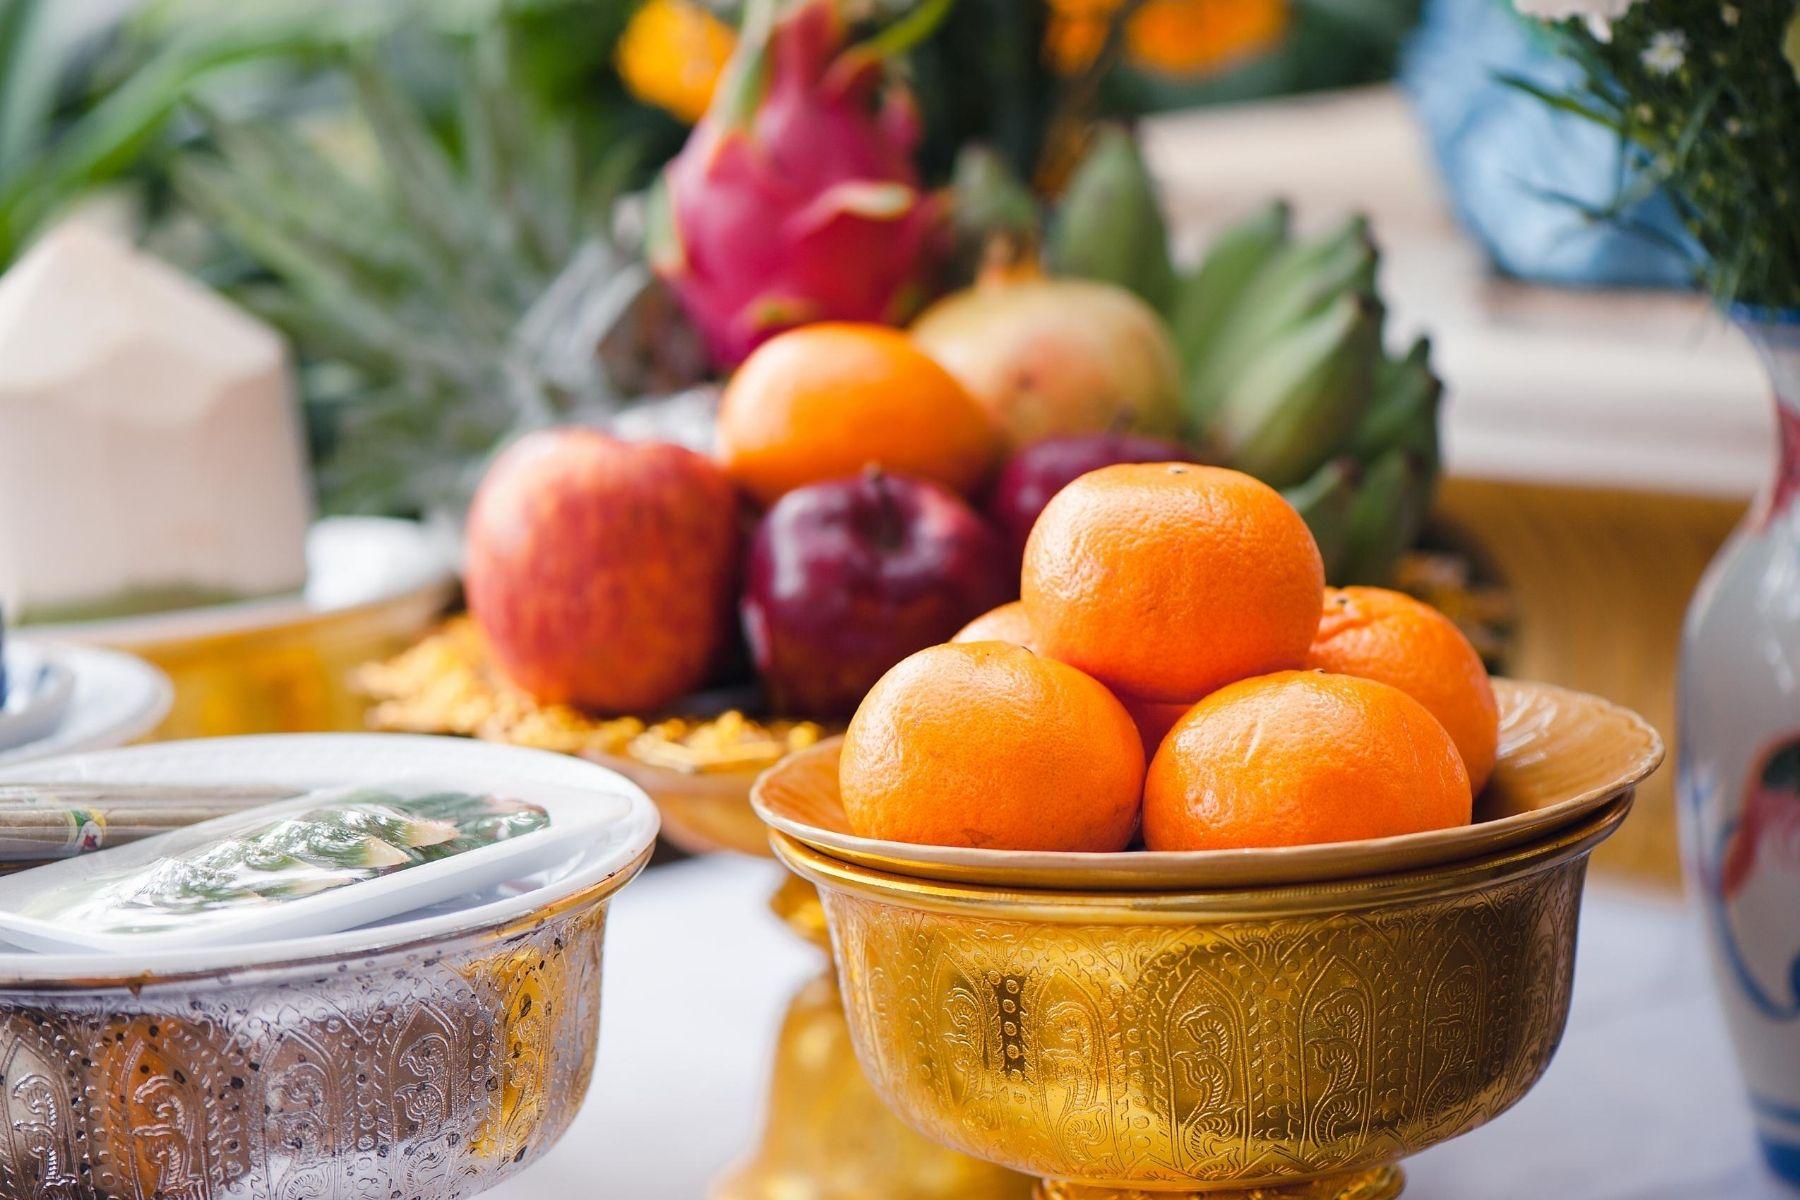 HappyFresh_Sacraficial_Foods_For_Spirit_Festival_Gourmet_Fruits